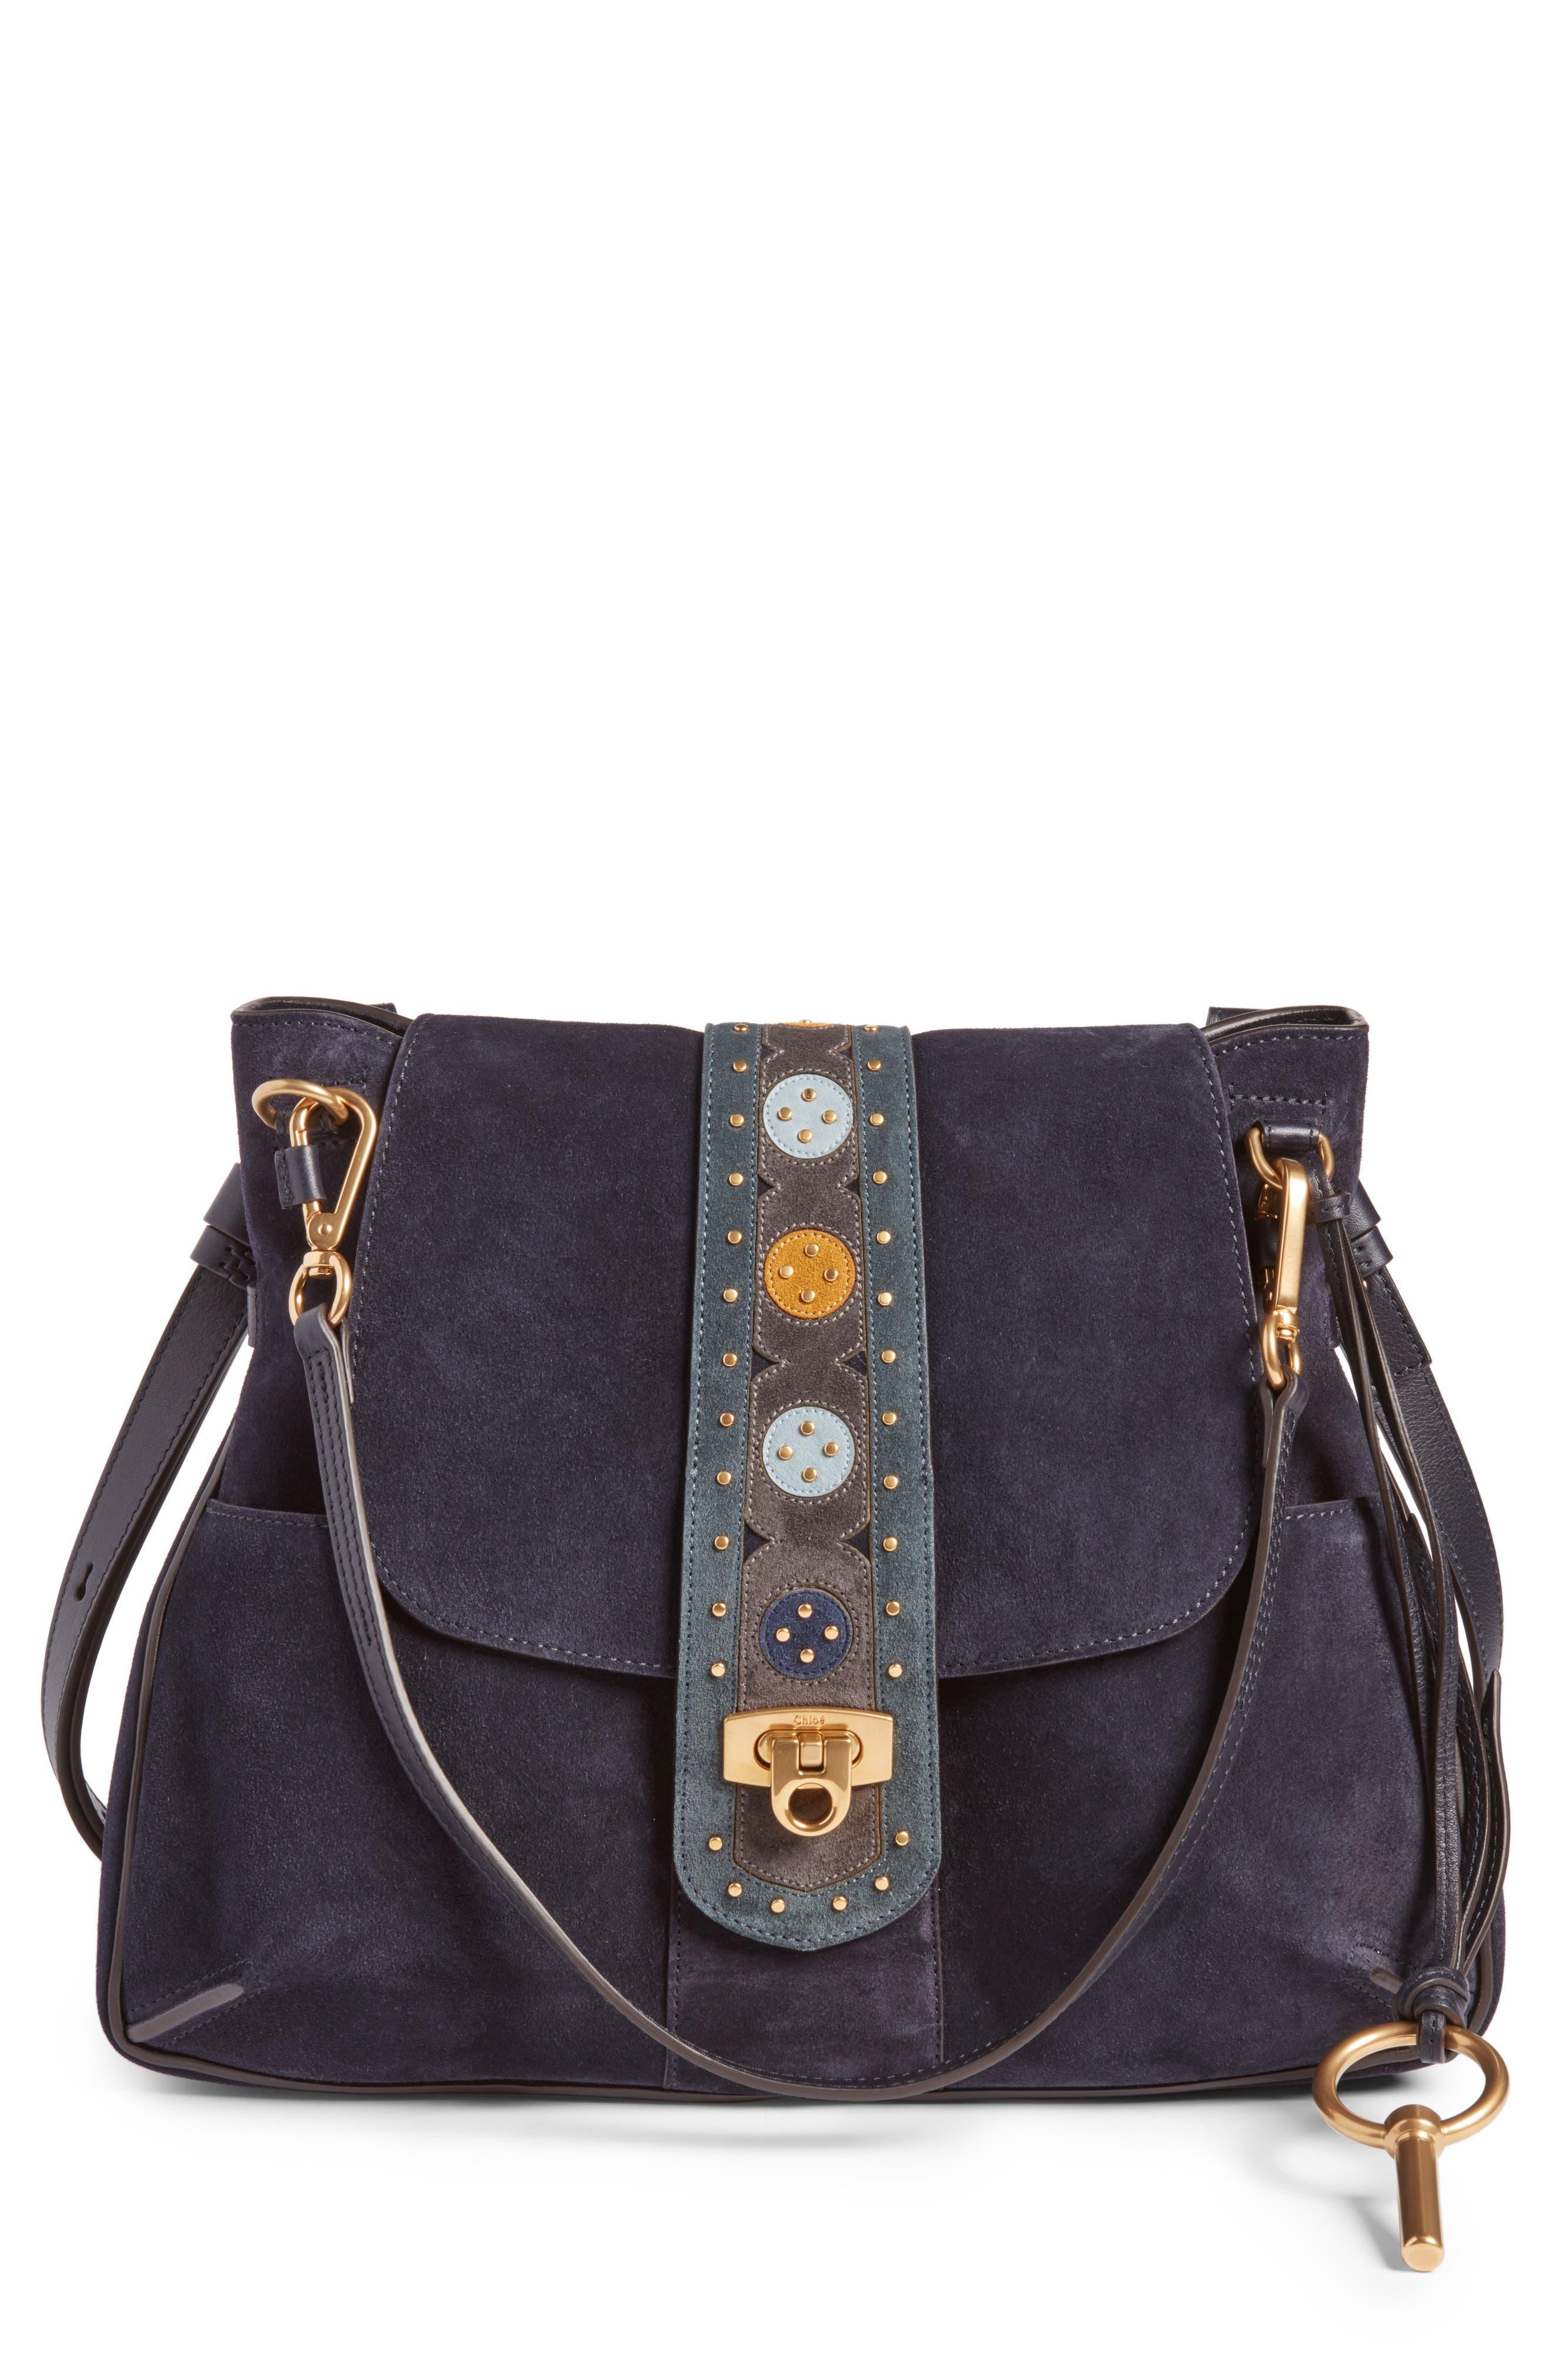 Medium Lexa Suede Shoulder Bag,                             Main thumbnail 1, color,                             412